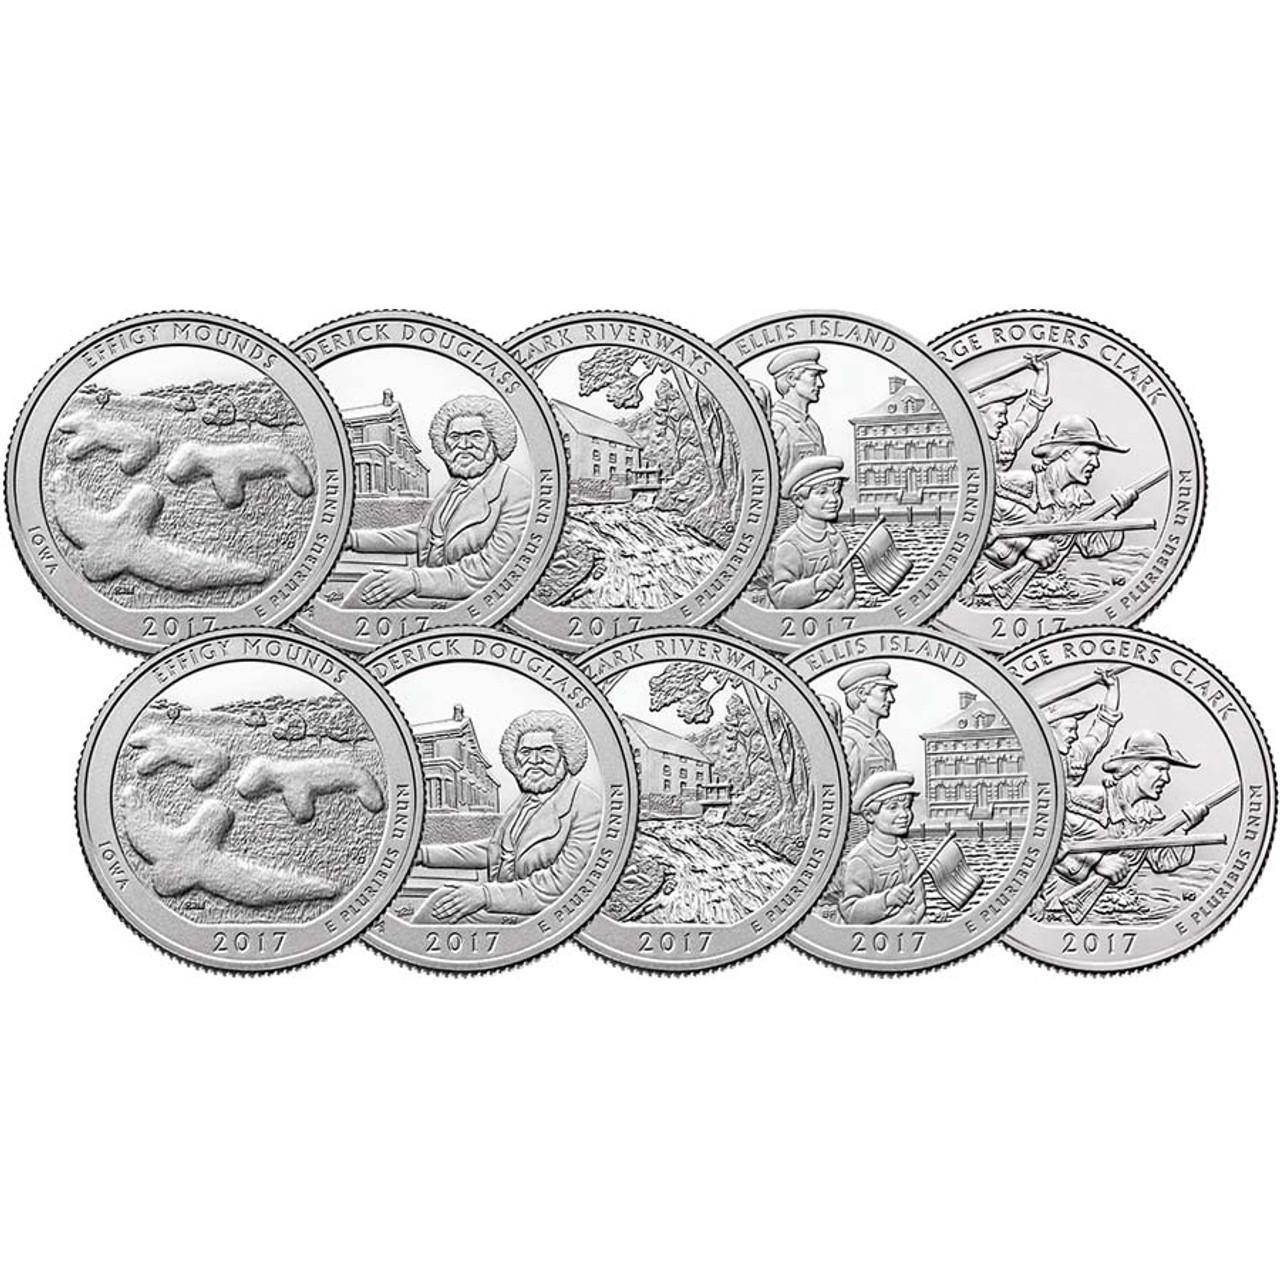 2017 P & D National Parks Quarter 10 Coin Set Brilliant Uncirculated Image 1